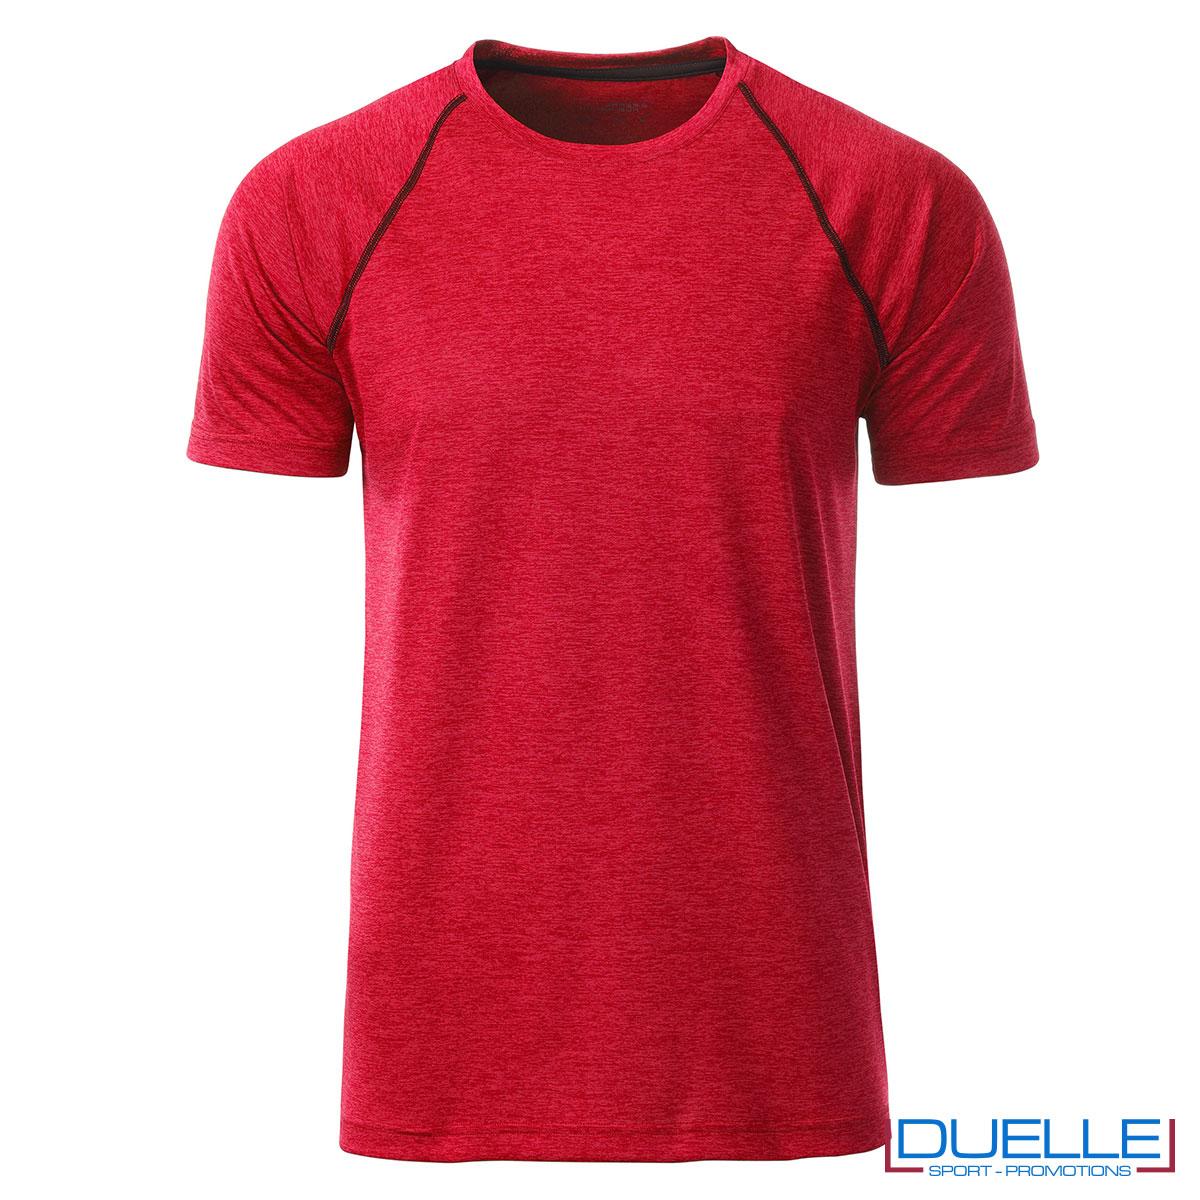 maglia rosso melange sport uomo